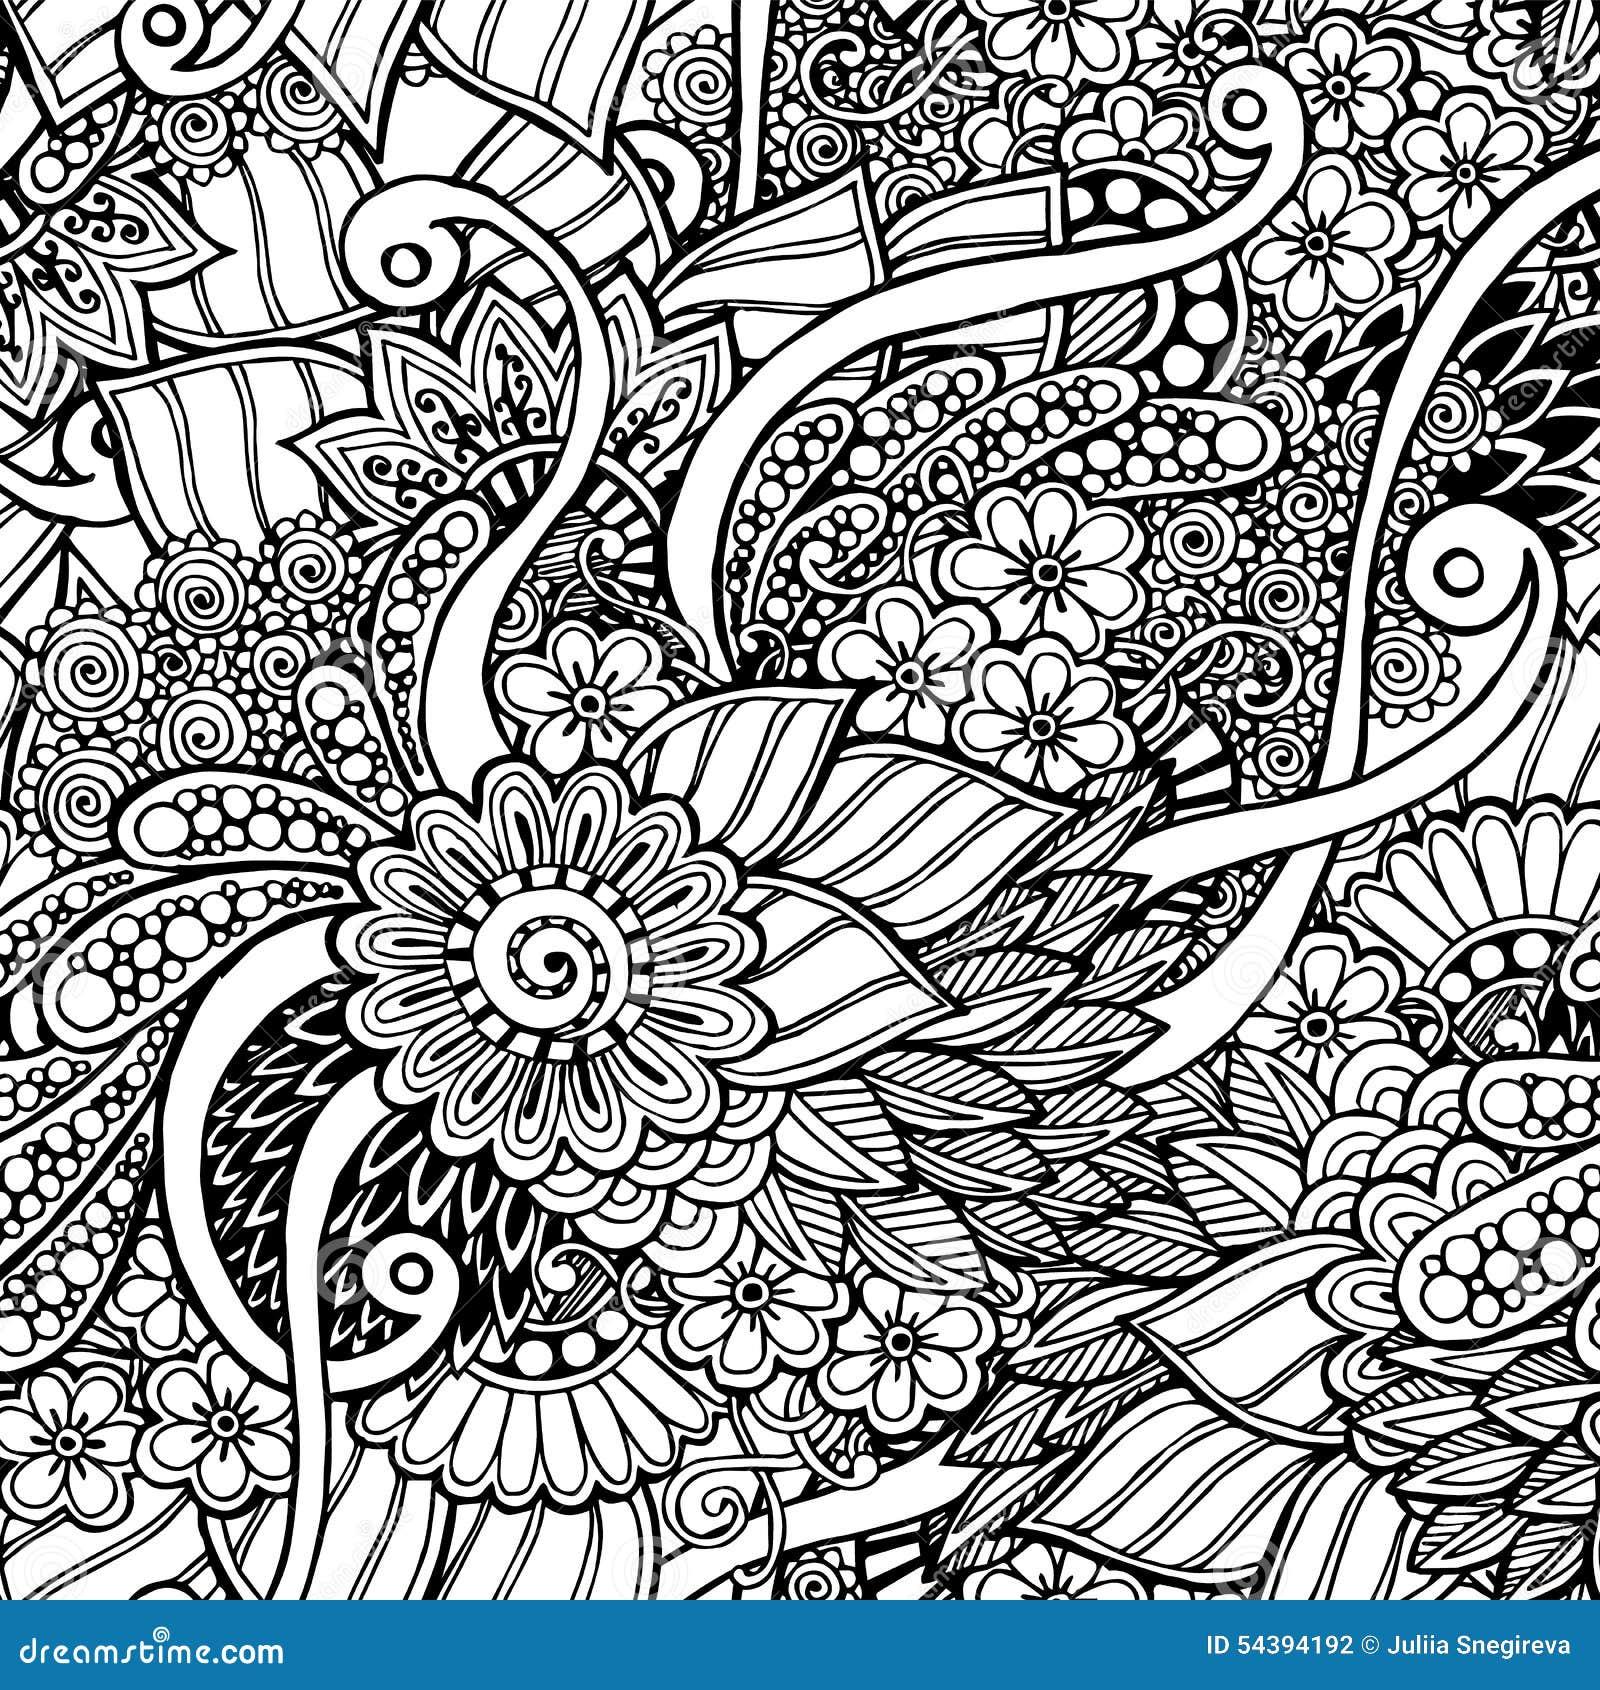 Http thumbs dreamstime com z seamless floral retro doodle black